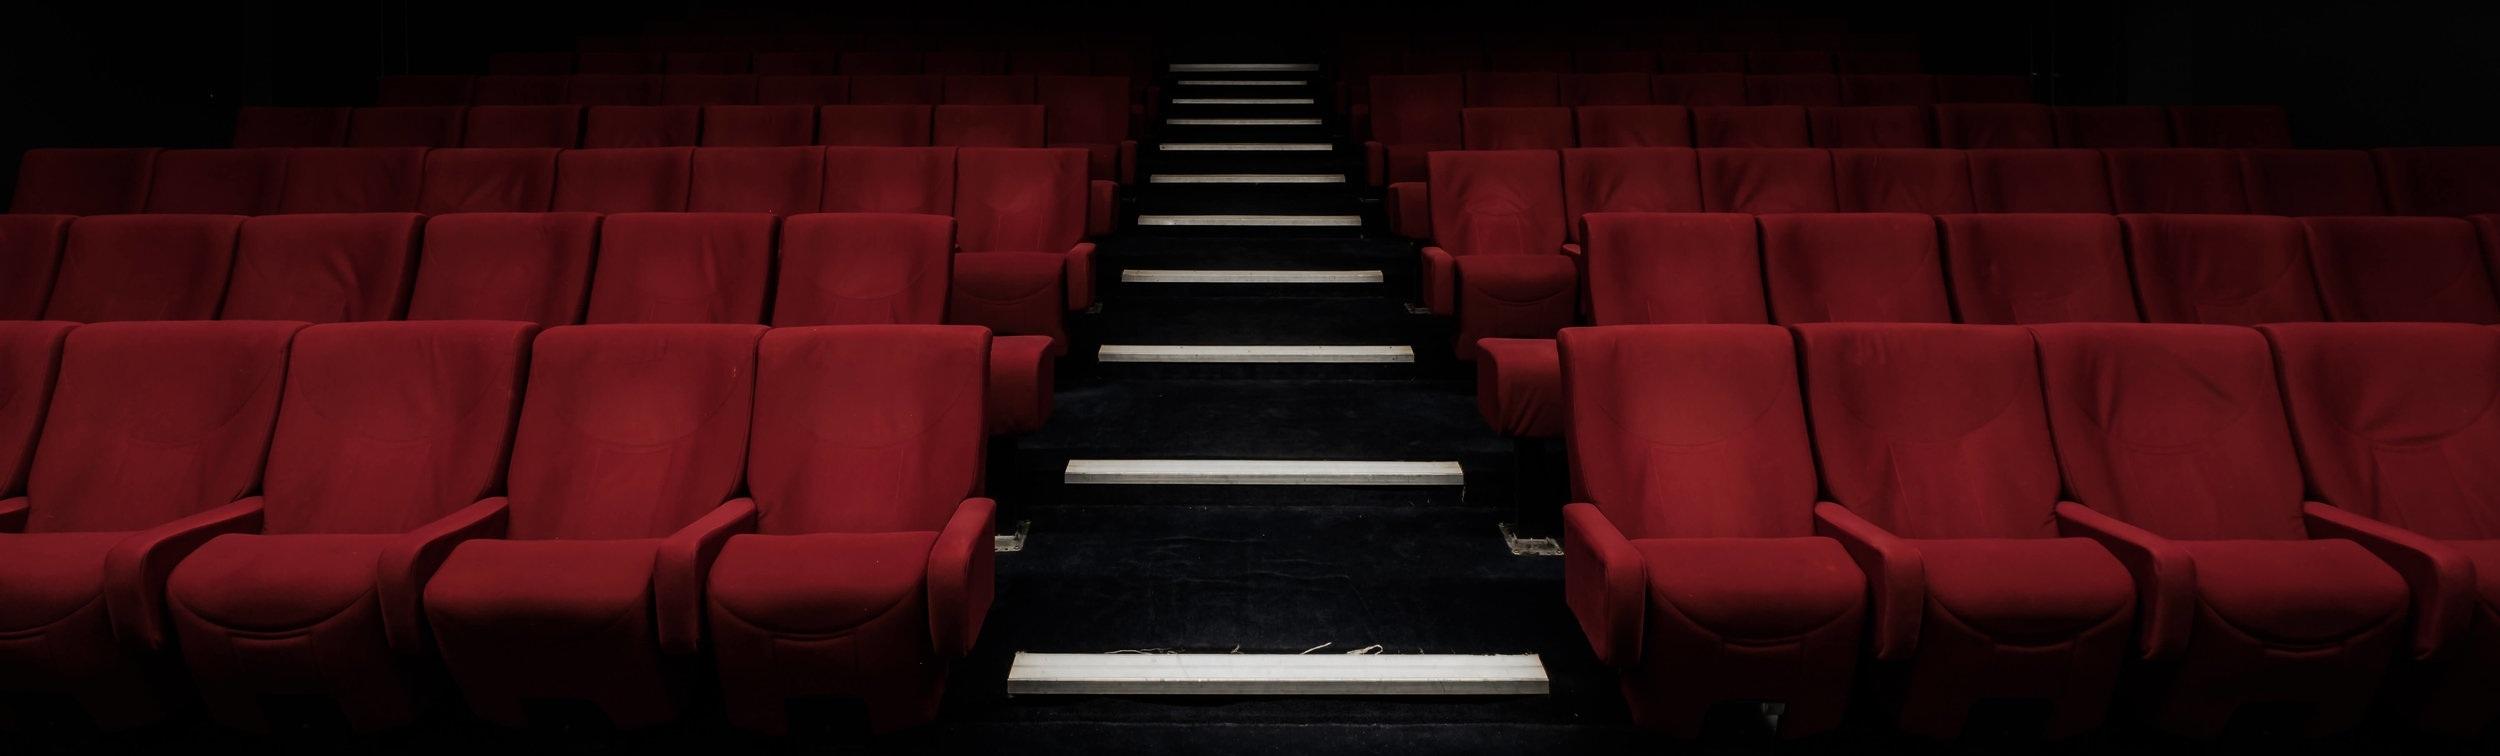 backlight-consulting-home-hero-darkened-cinema-inside.jpg